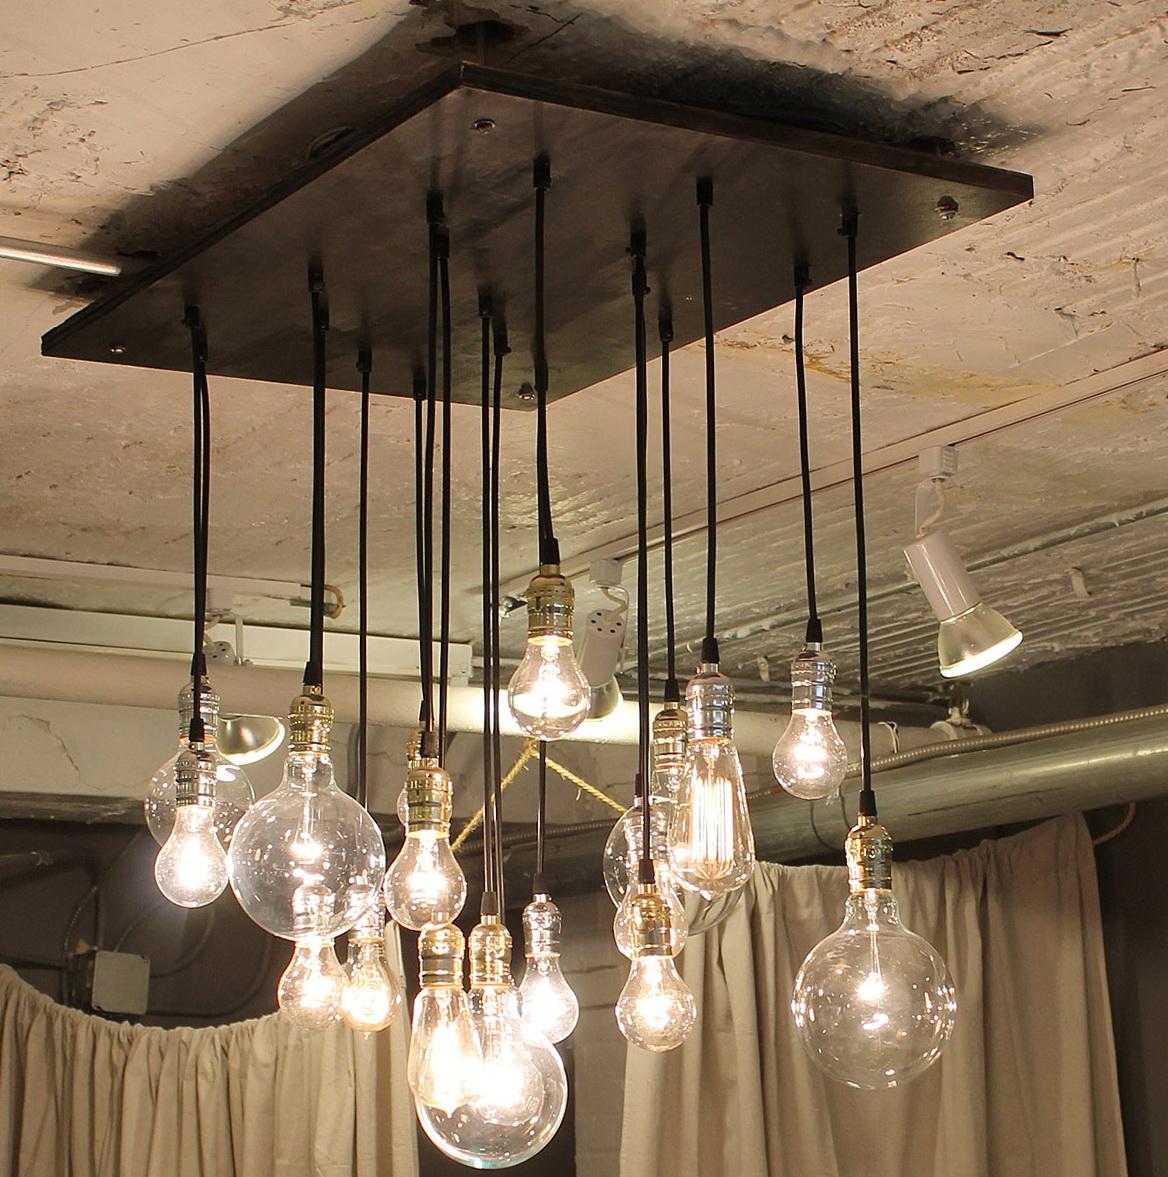 Vintage Edison Bulb Chandelier